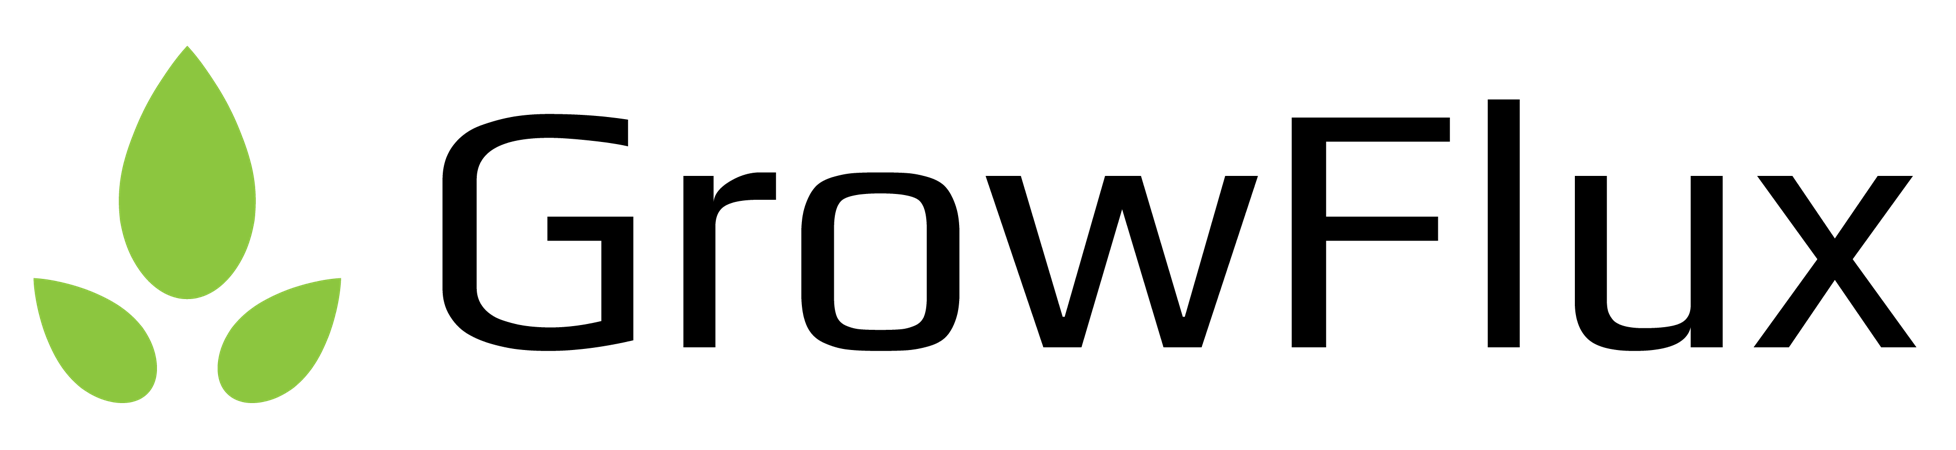 GrowFlux_logo_2.png